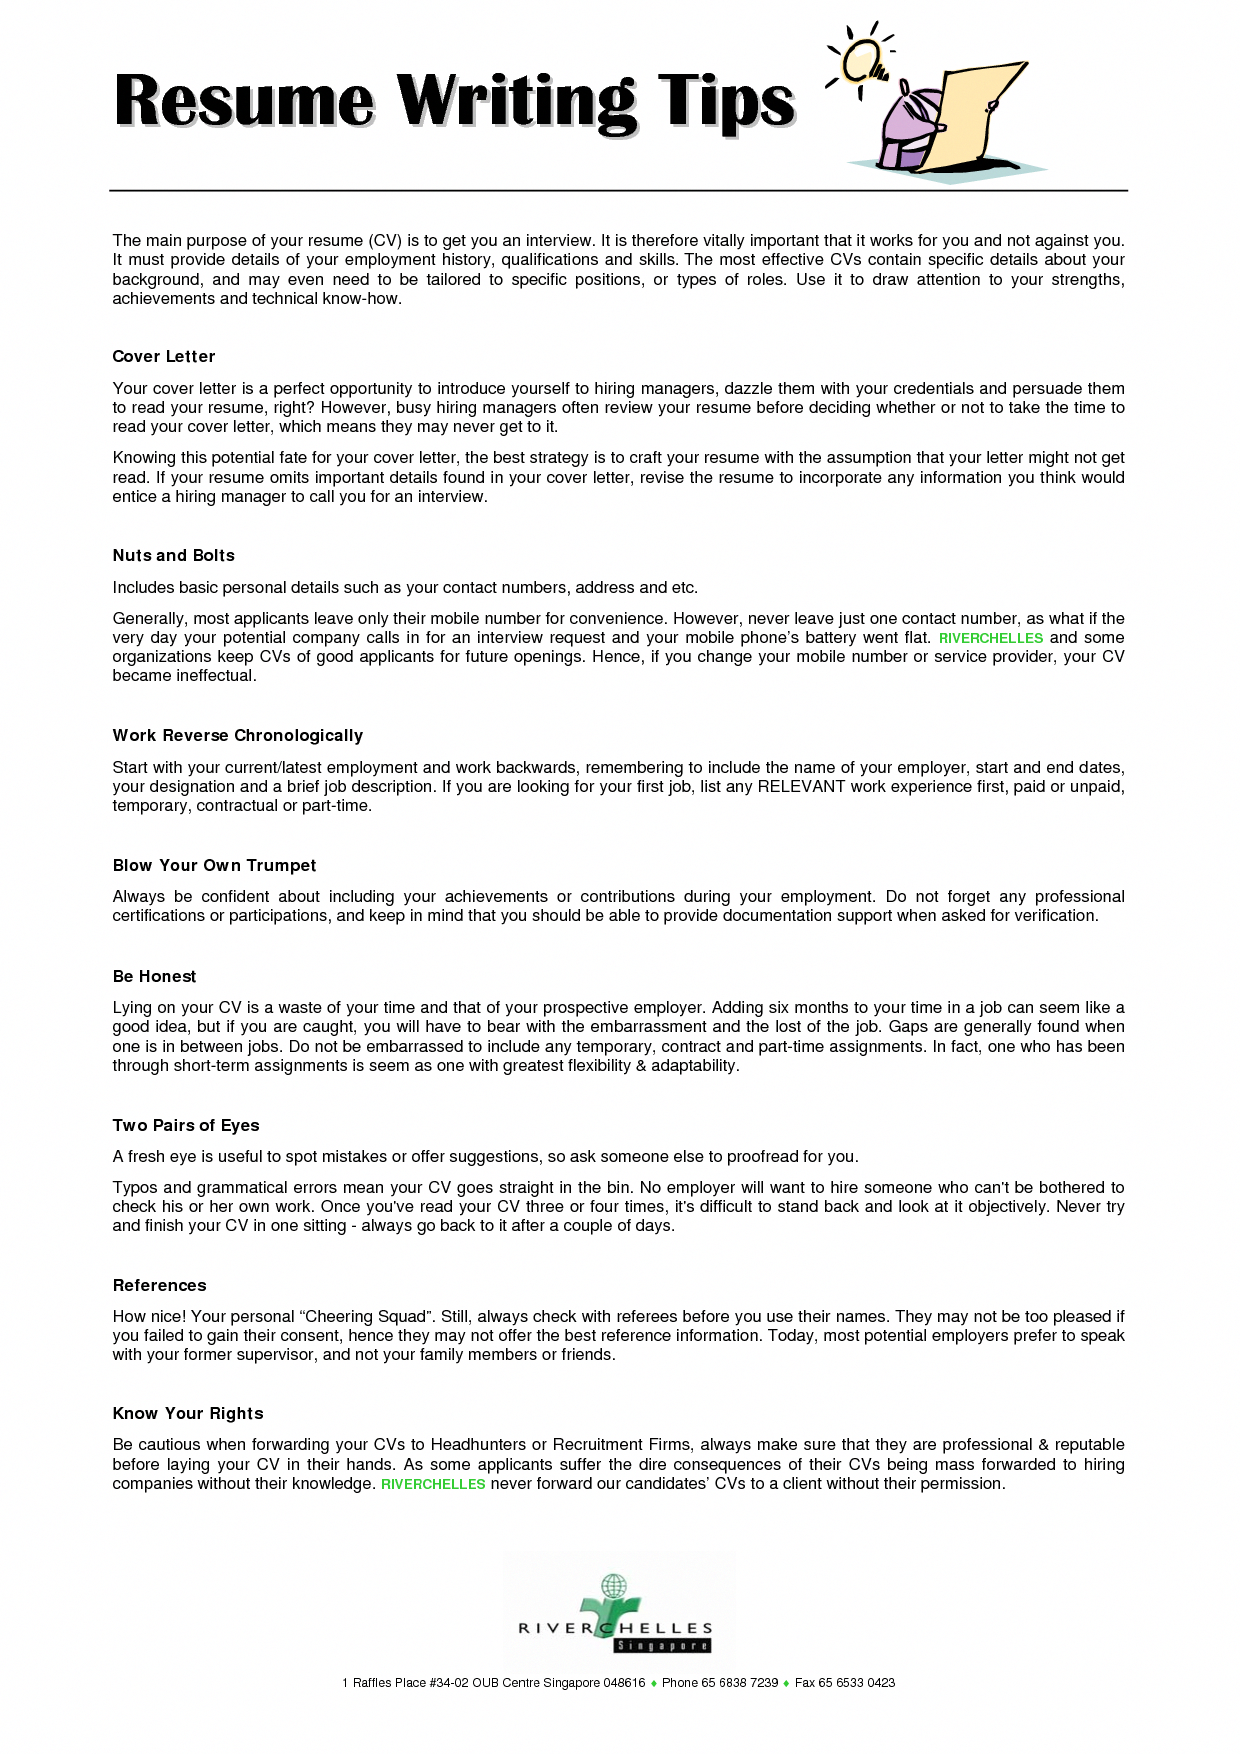 resume writing tips ResumeWritingExamples Resume